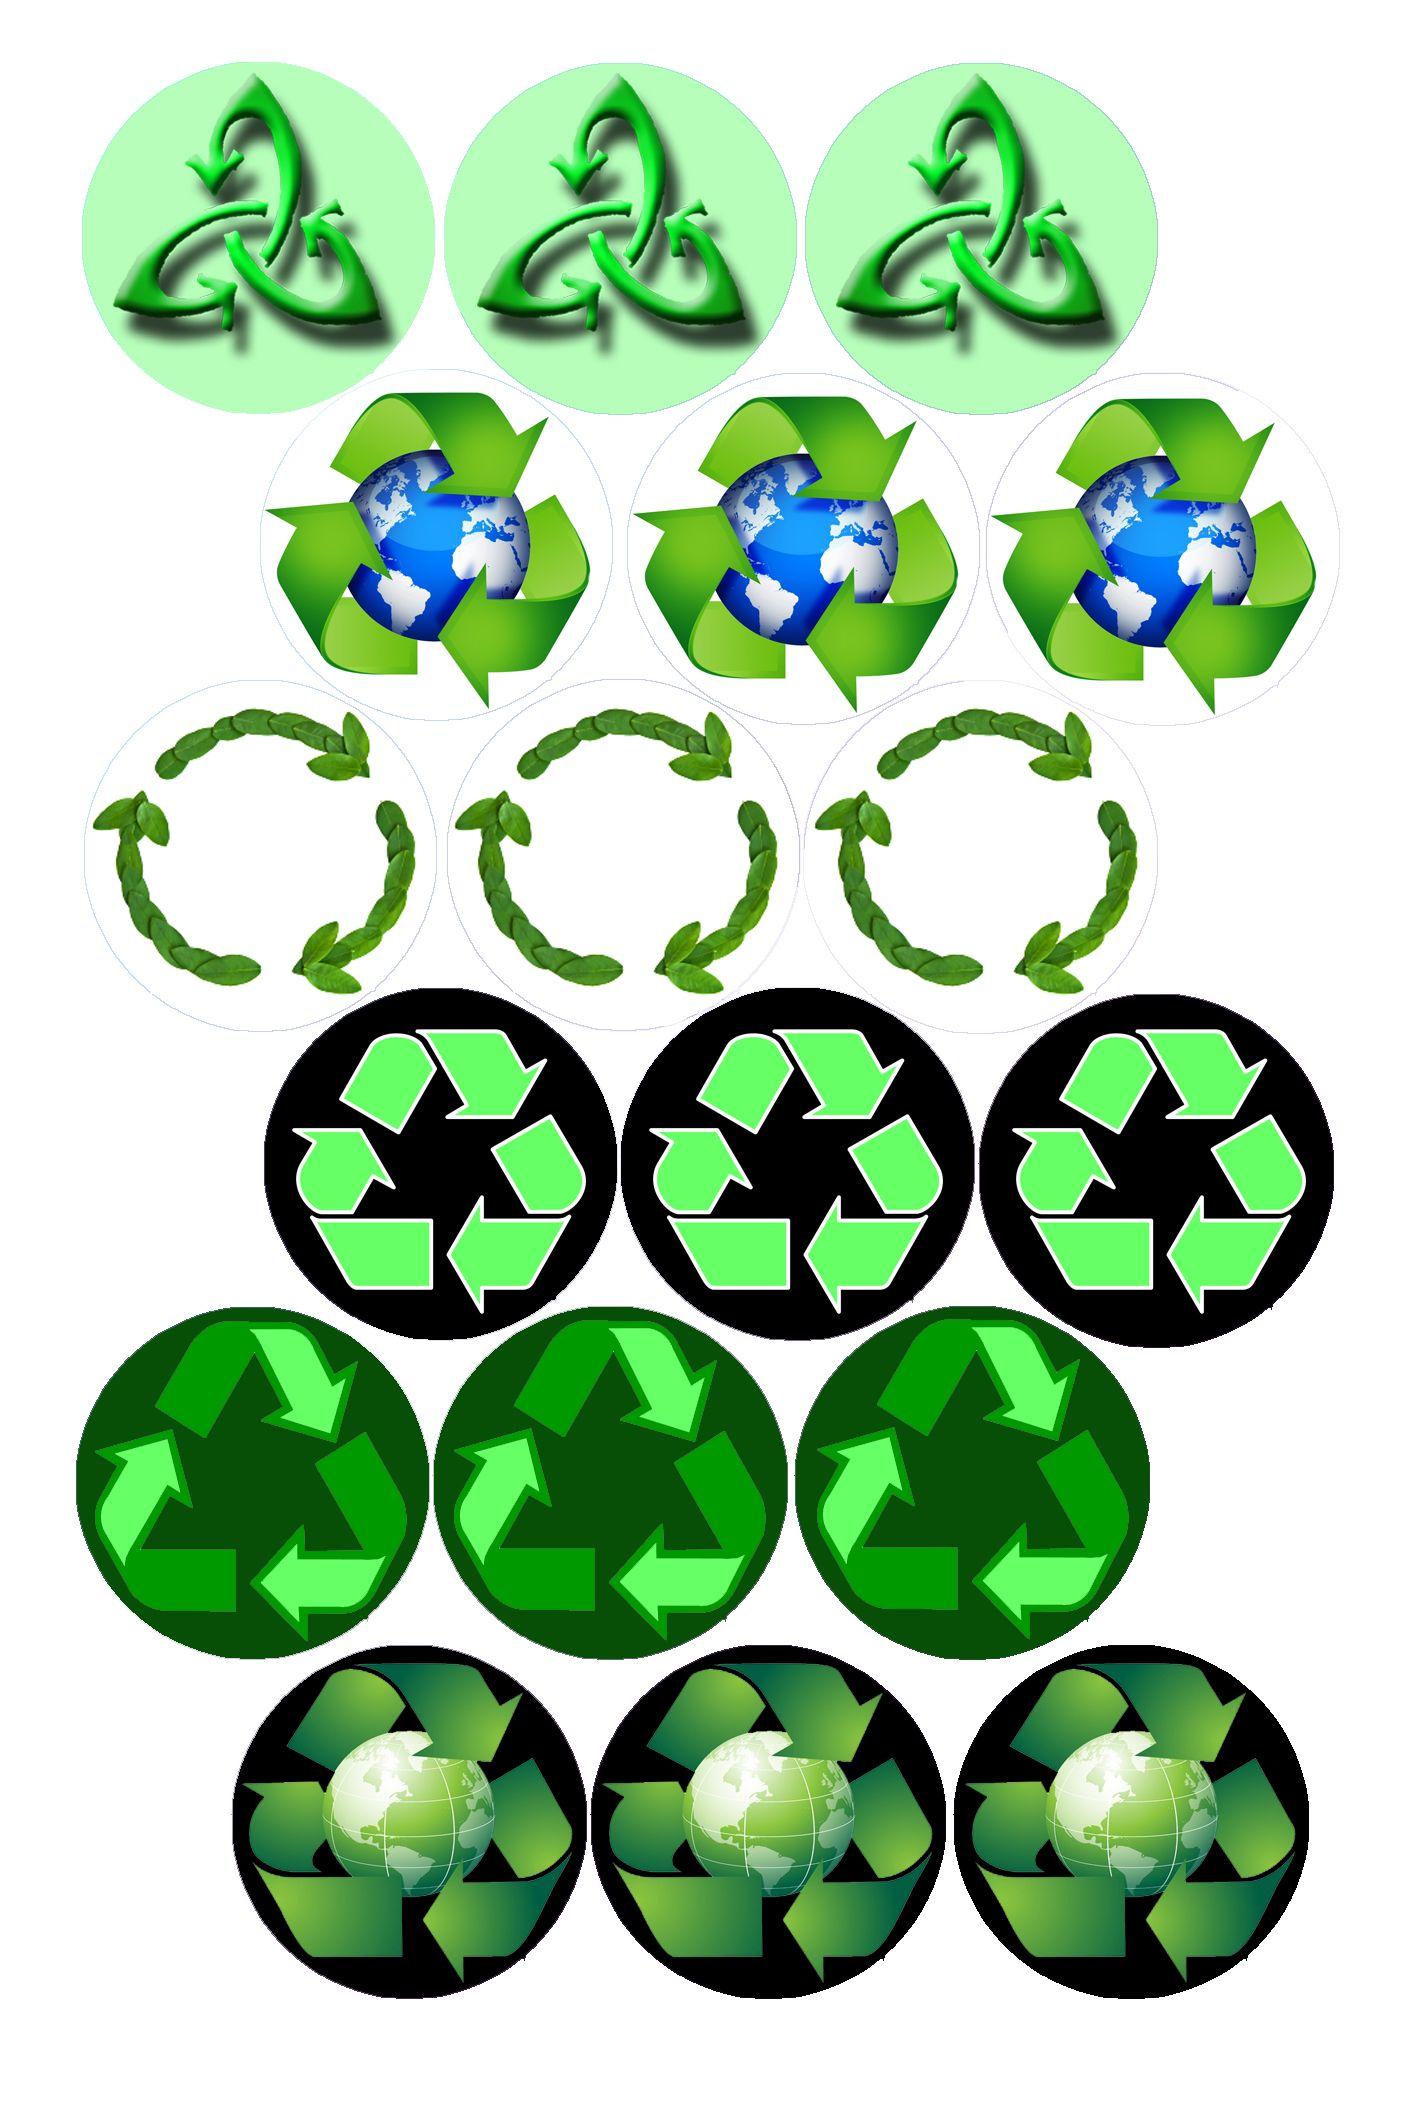 Recycle symbols bottle cap image pack formatted for printing on 4 recycle symbols bottle cap image pack formatted for printing on 4 x 6 photo biocorpaavc